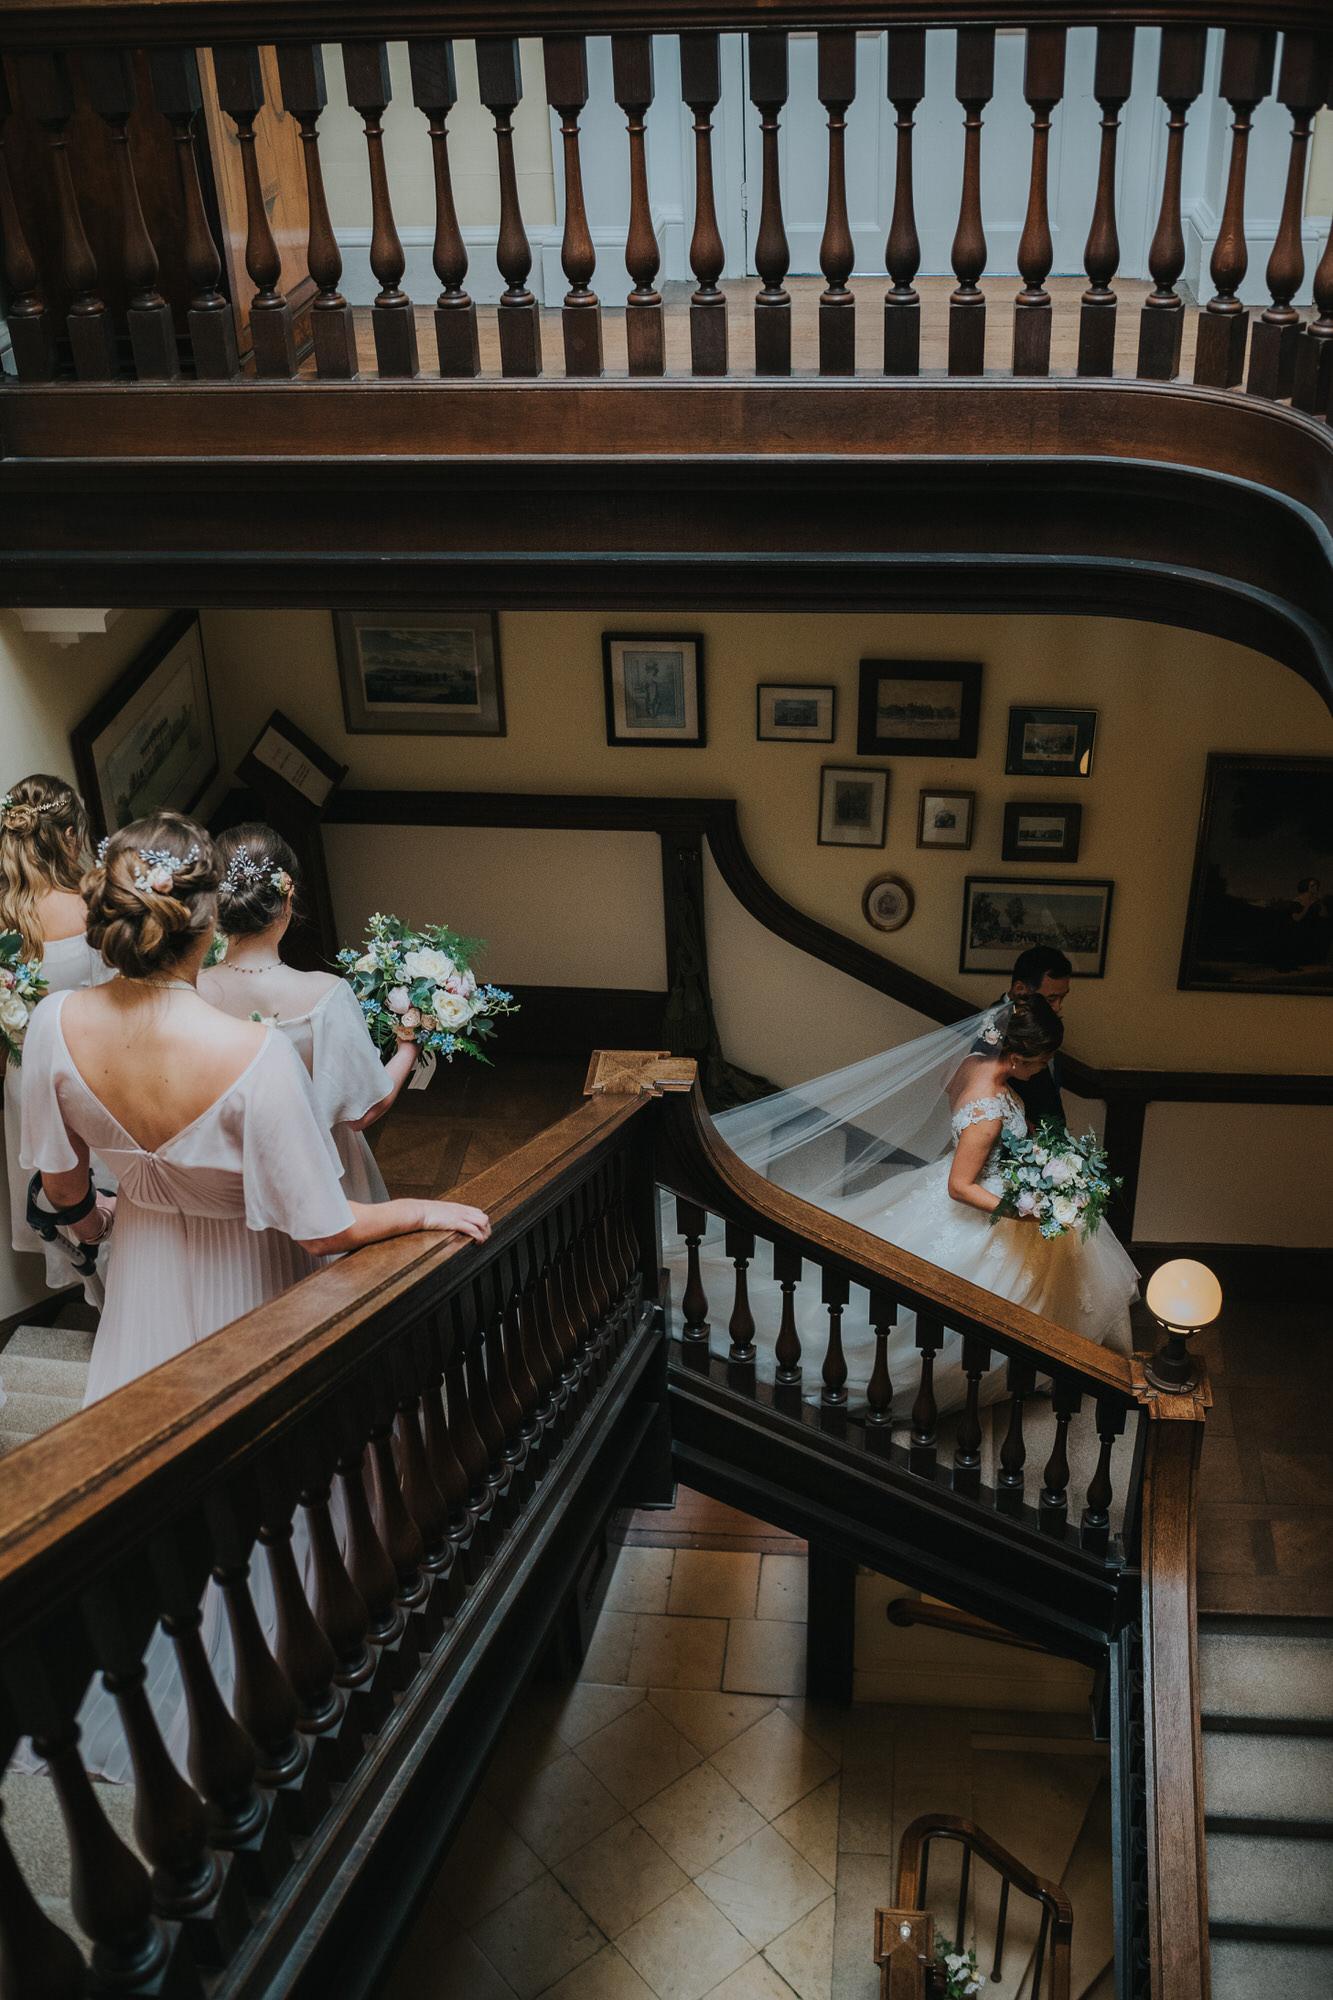 Kirtlington park staircase